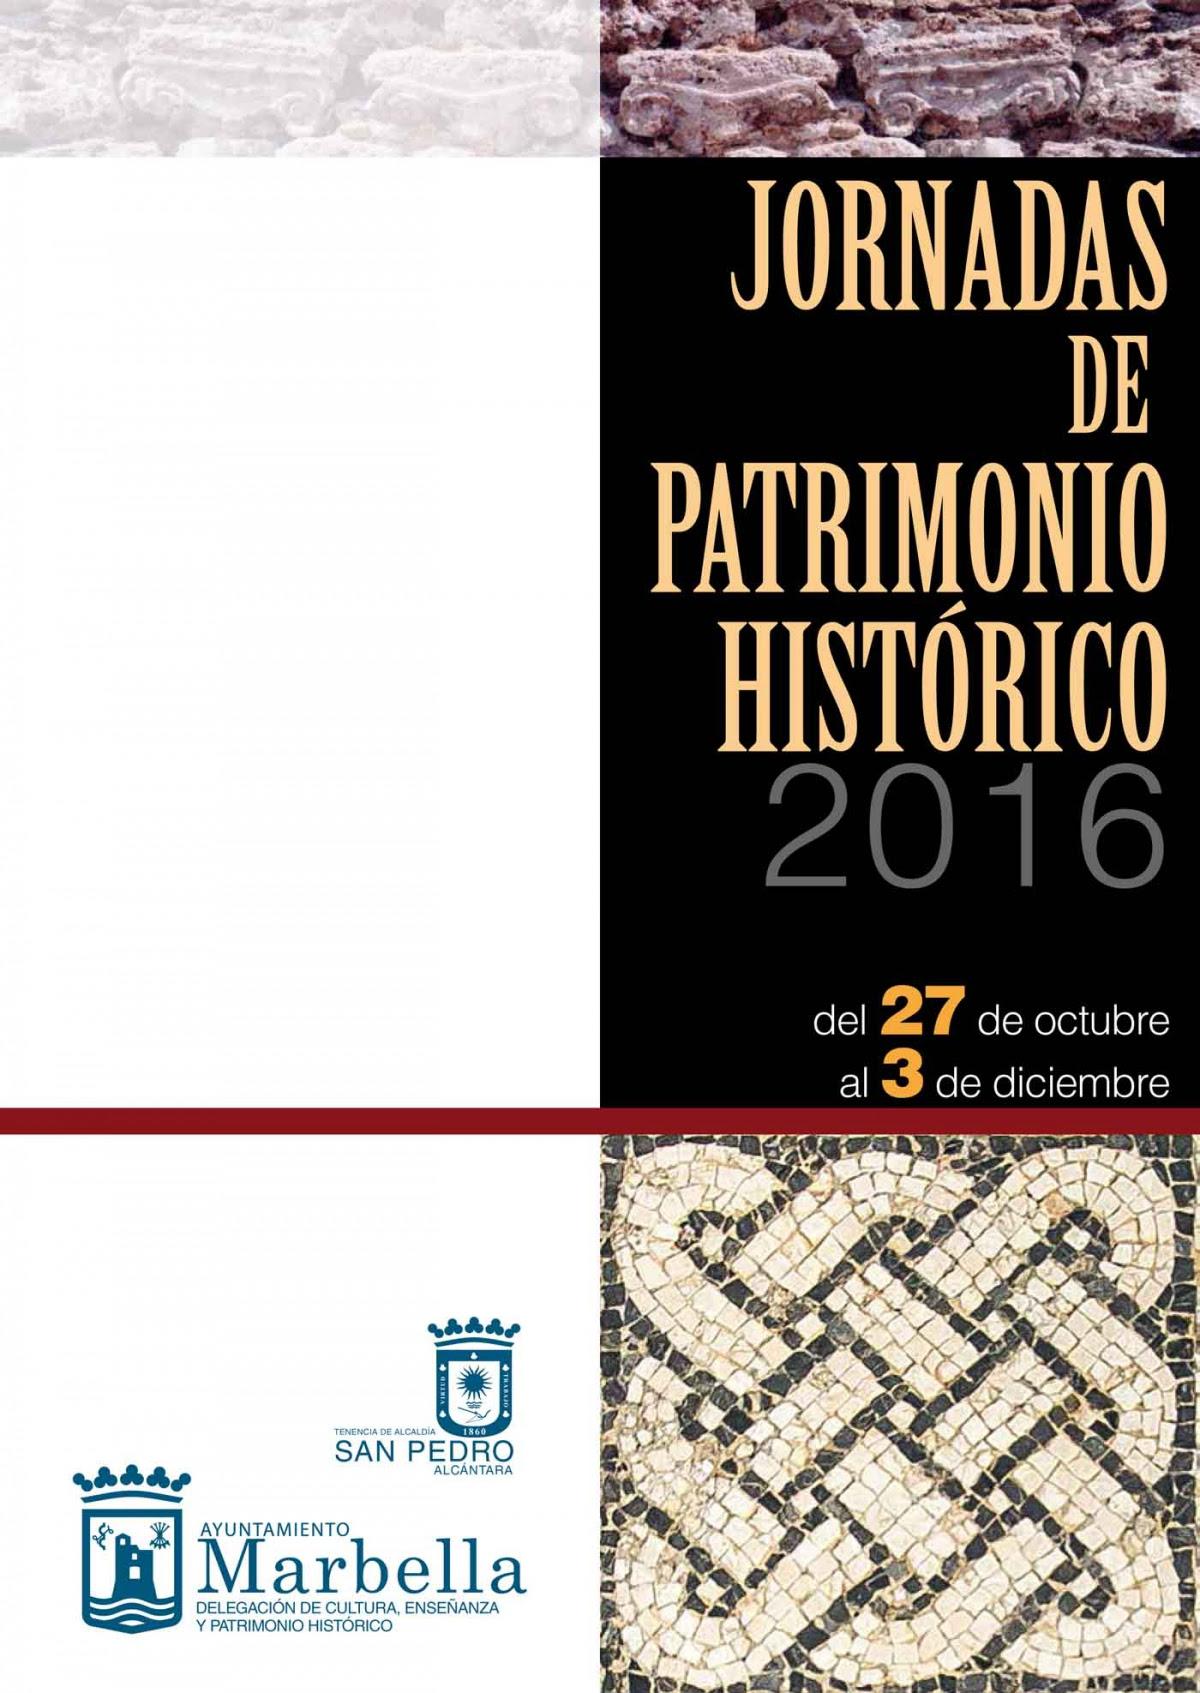 Resultado de imagen de JORNADAS DE PATRIMONIO HISTÓRICO 2016